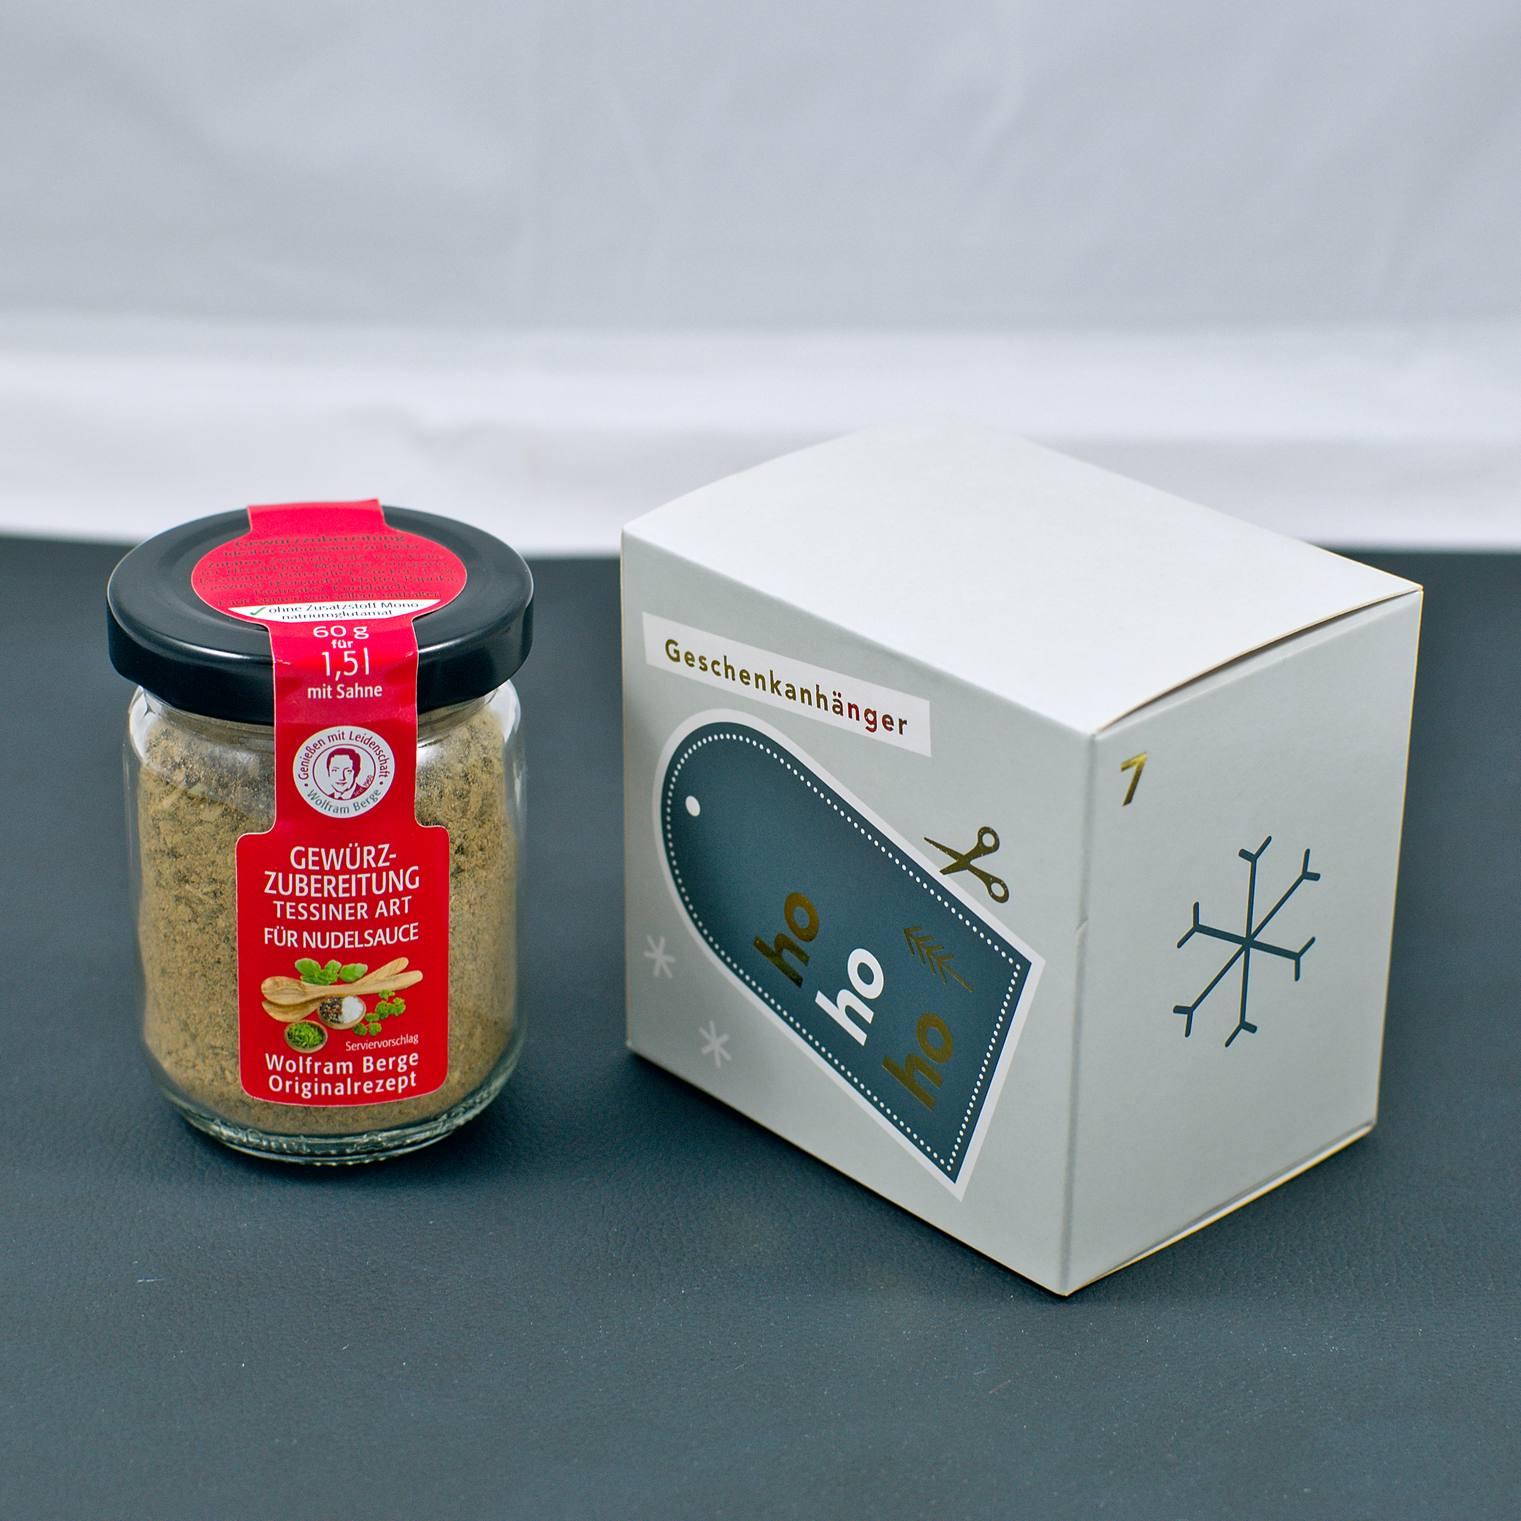 Gewürzzubereitung – Tessiner Nudelsauce   7. Türchen